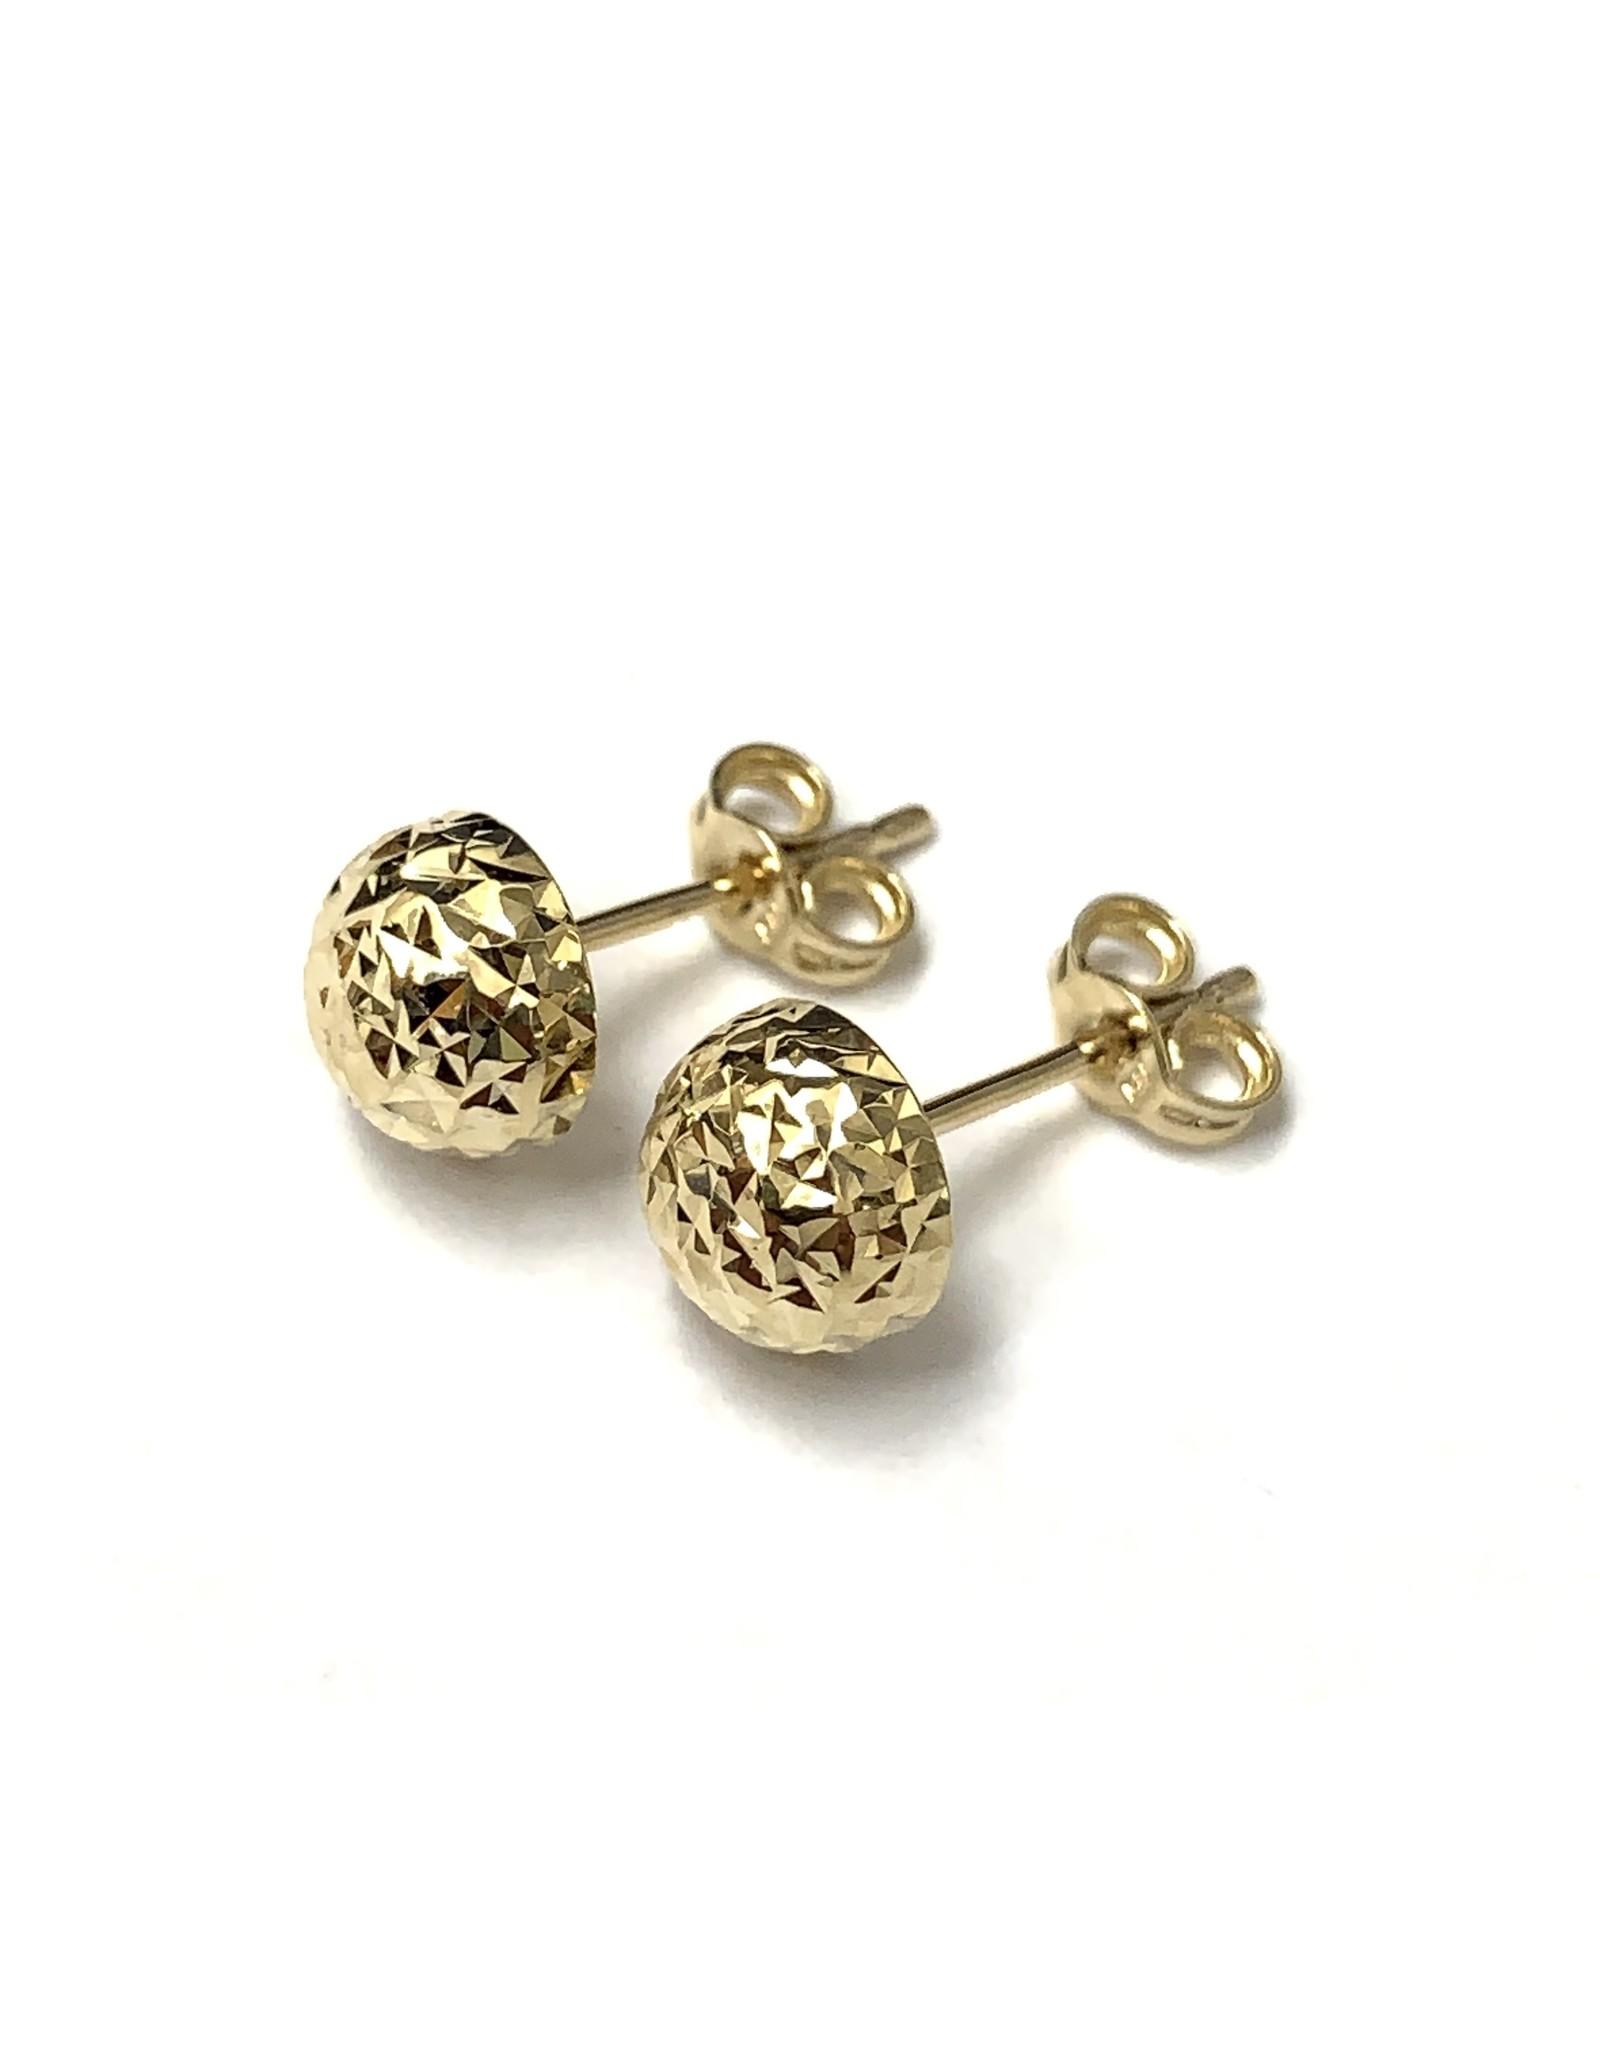 Half-Ball Stud Earrings 14KY